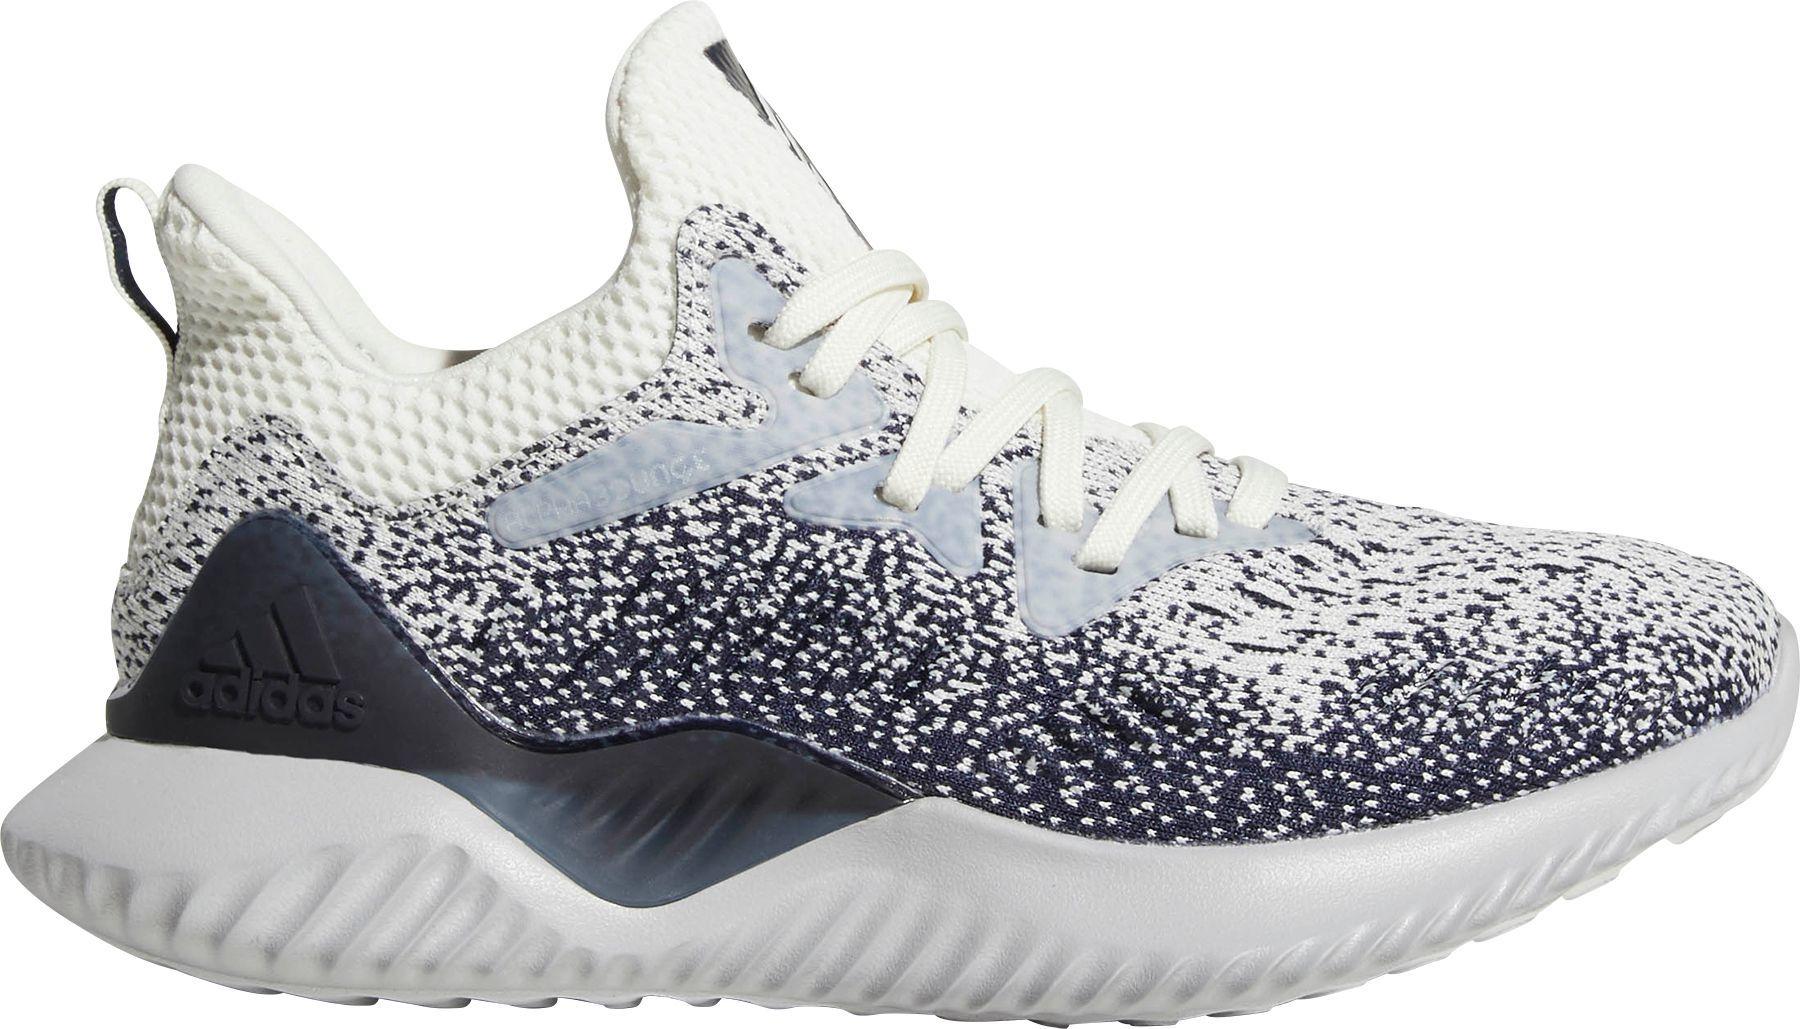 buy popular dc90b b2de8 adidas Kids Grade School alphabounce beyond Running Shoes, White Adidas  Kids, Adidas Men